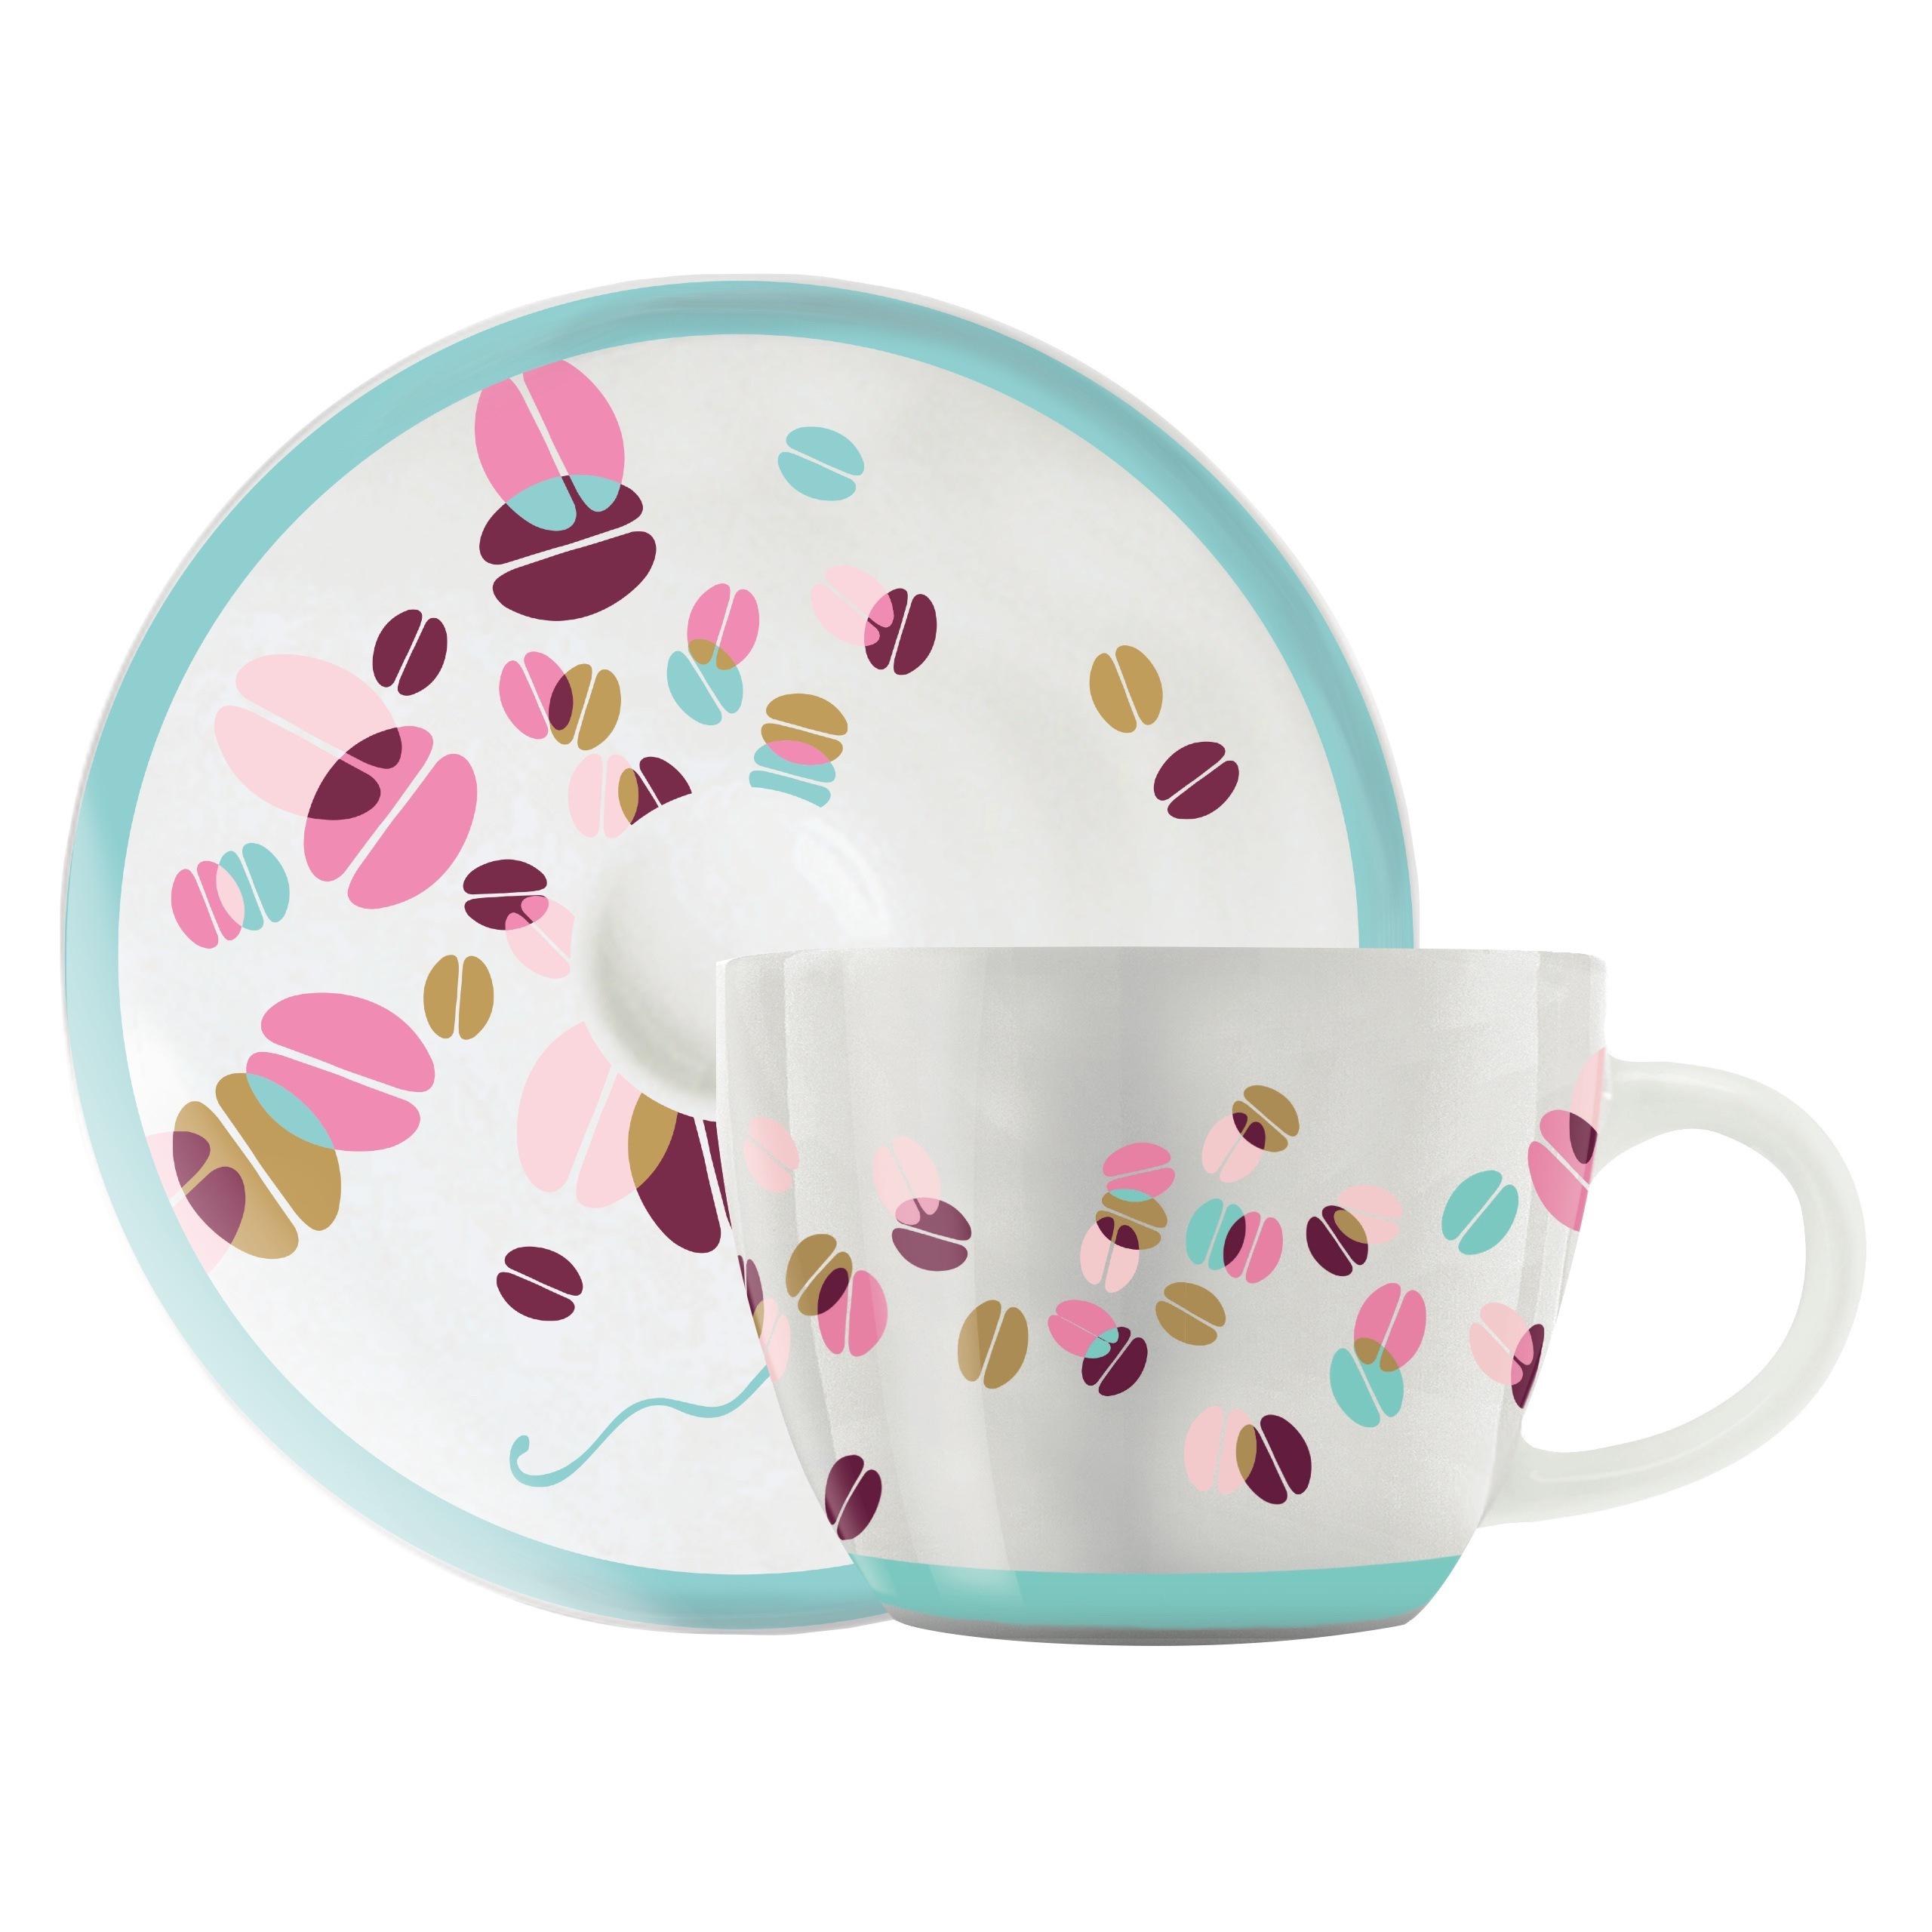 Ritzenhoff My Little Darling Espresso Cup C.Schult